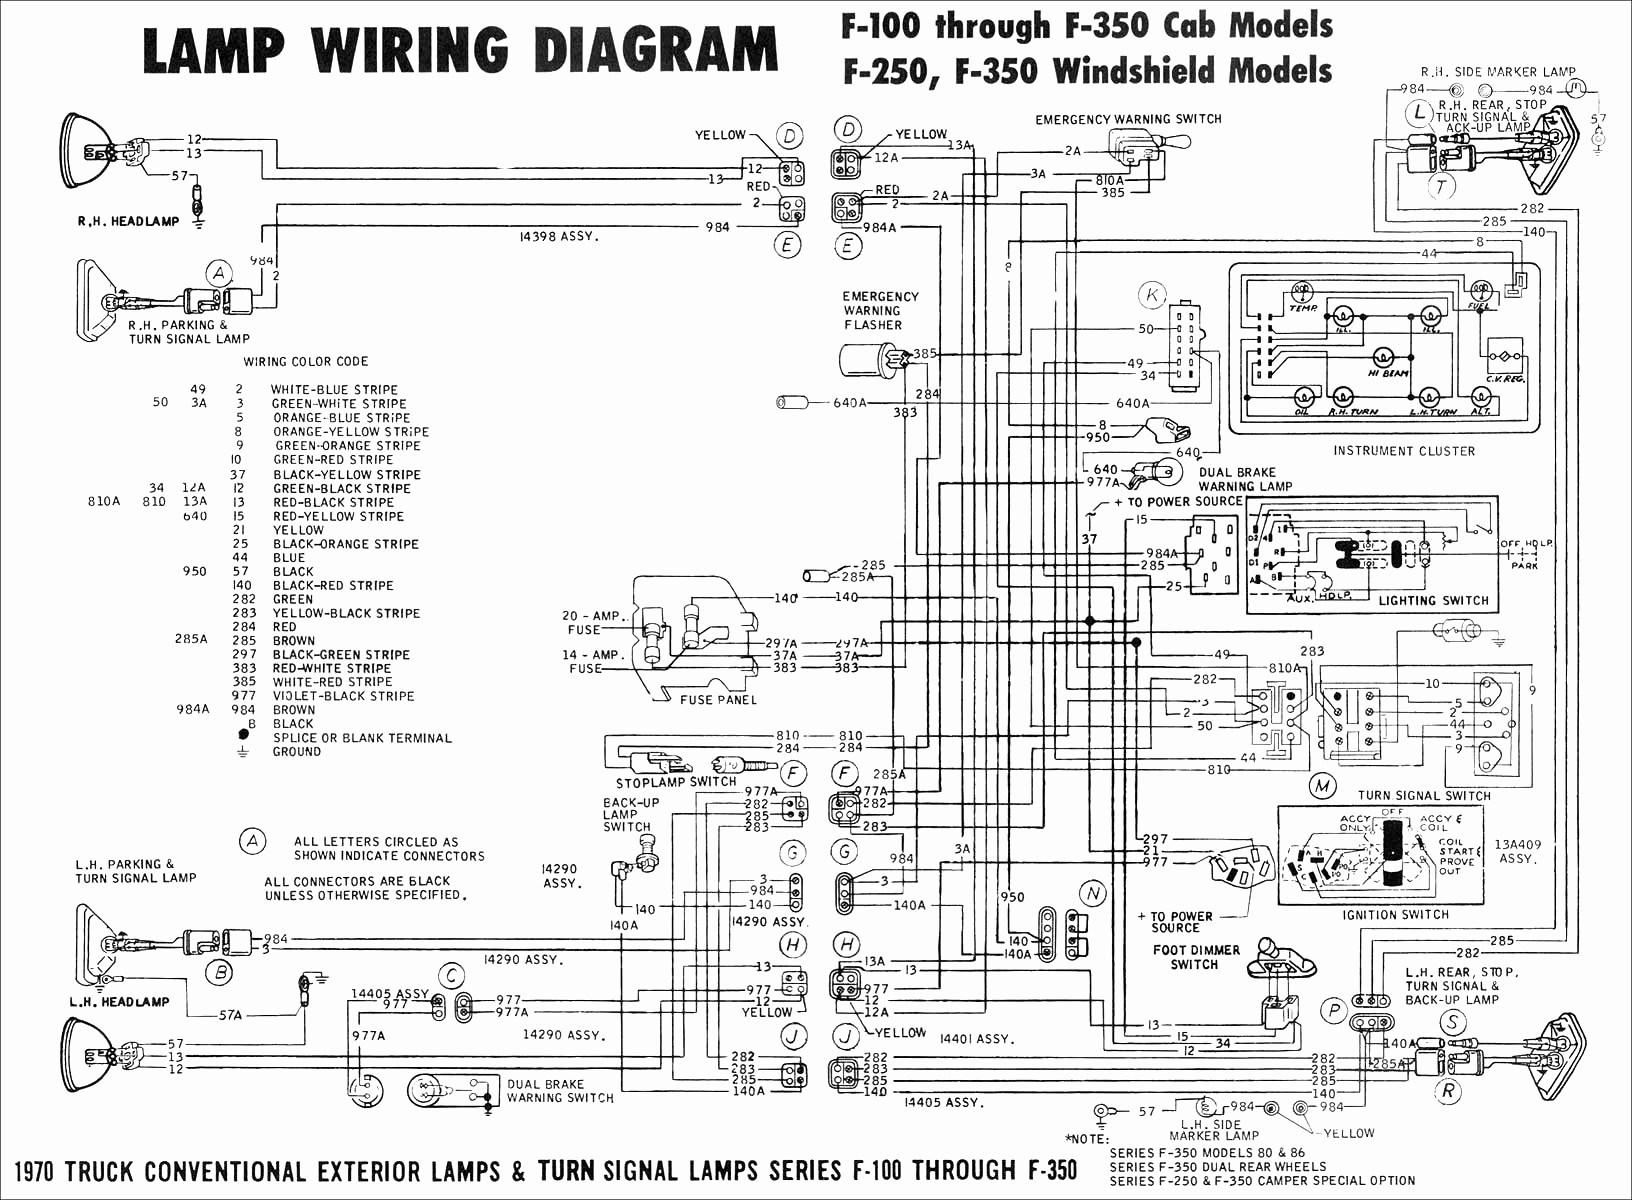 Pioneer Dxt X2669ui Wiring Diagram Wiring A Series Of Schematics Wiring Diagram Variable